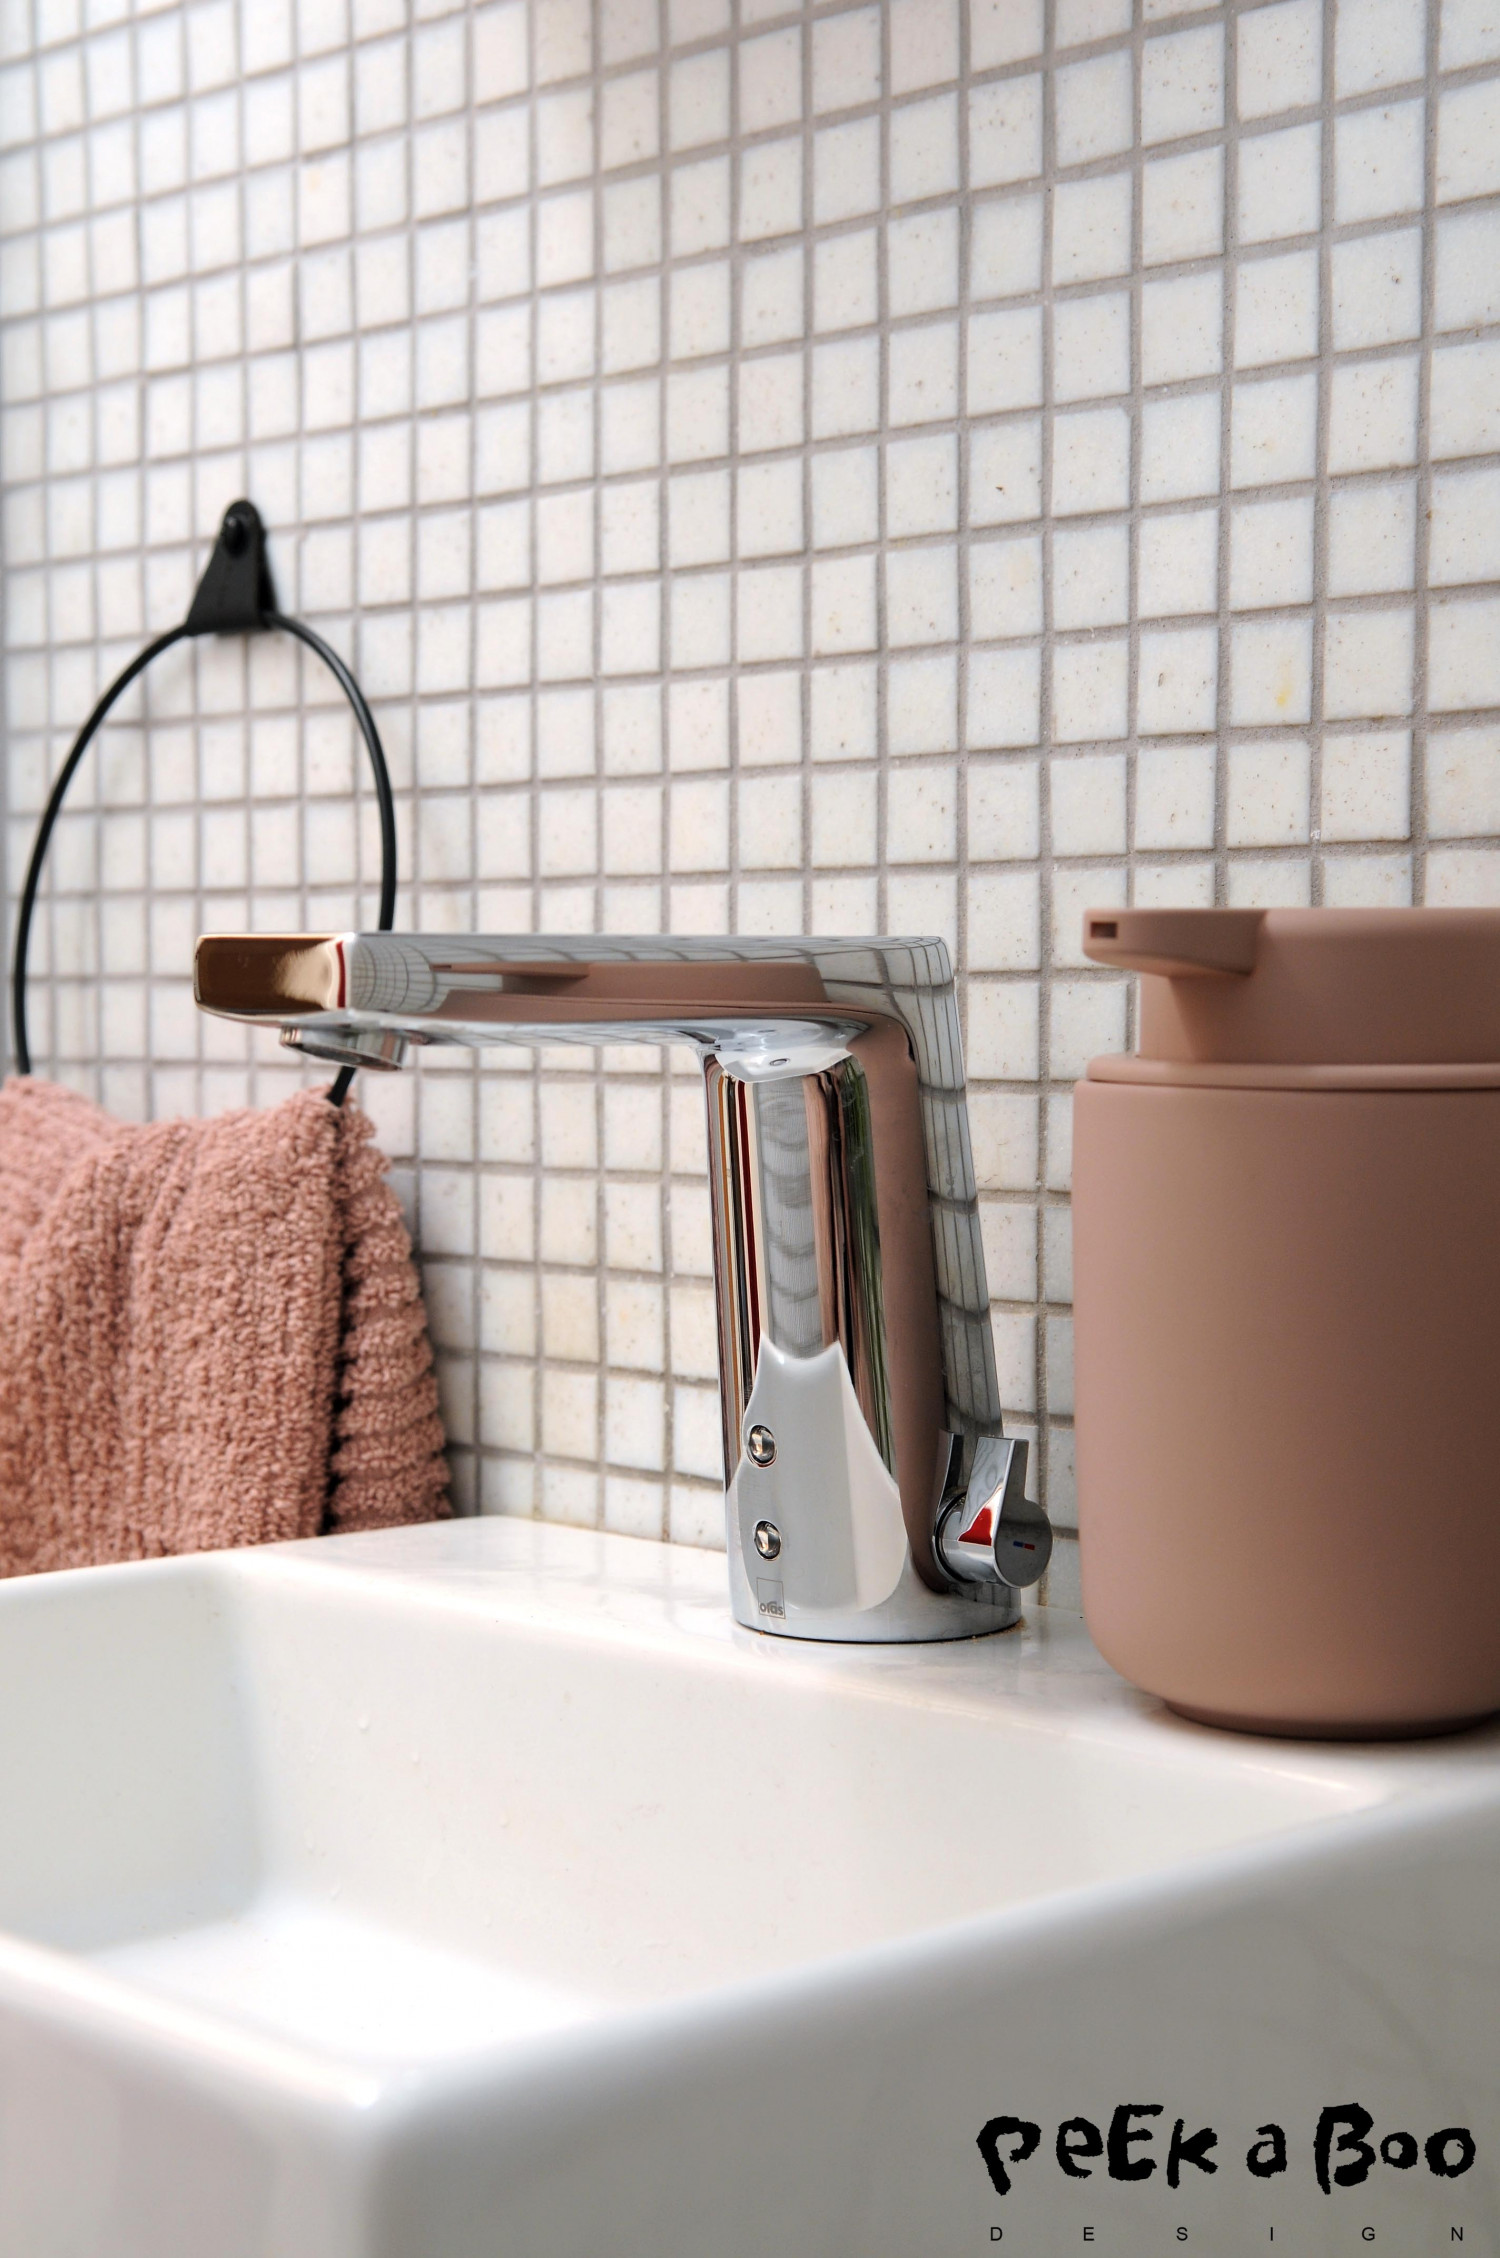 The new Oras luminaire electra on the toilet.